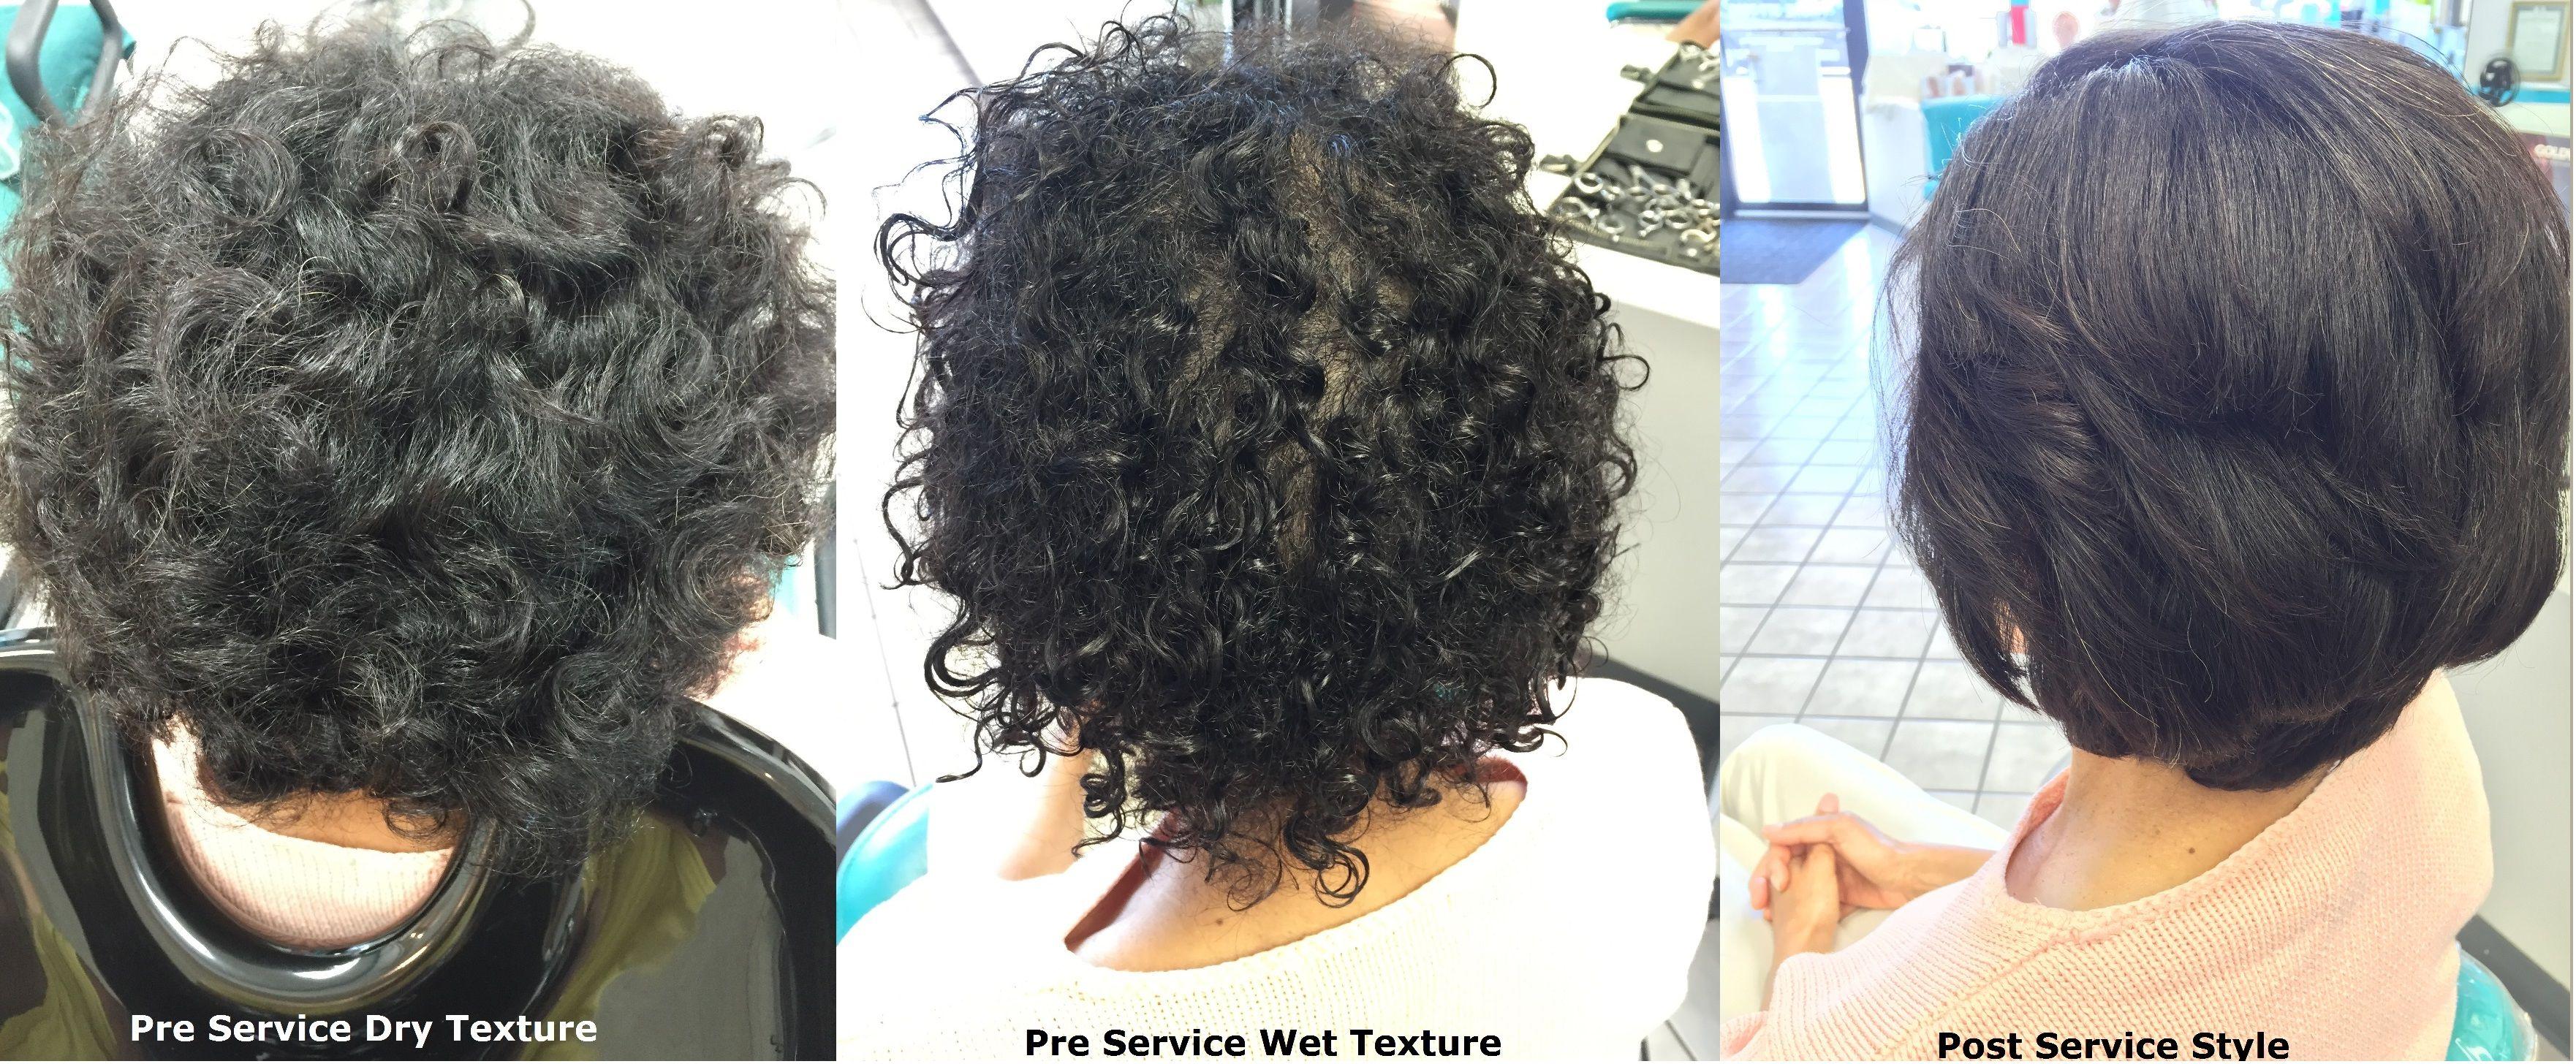 Goldwell Kerasilk Smoothing Service Has Taken Over Pk Salon Hair Hairstyle Fashion Hairoftheday Keratin Smoothing Treatment Hair Life Straight Hairstyles